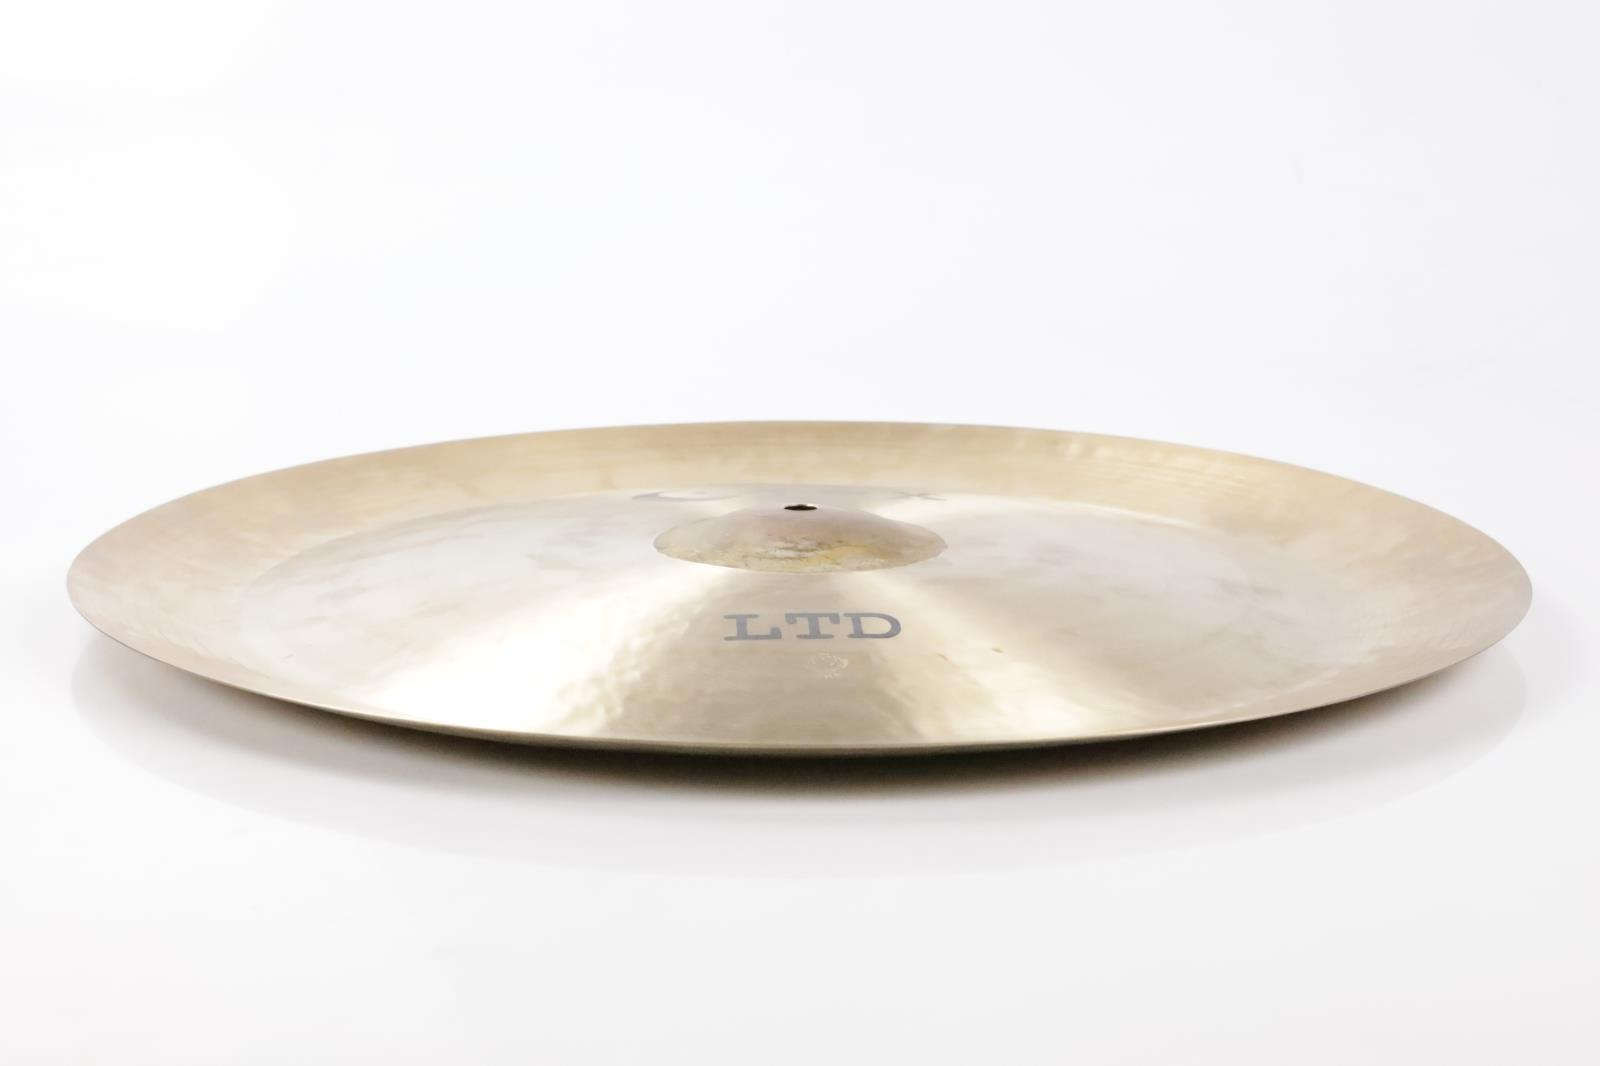 trx 21 ltd china cymbal dave krusen 34843 ebay. Black Bedroom Furniture Sets. Home Design Ideas